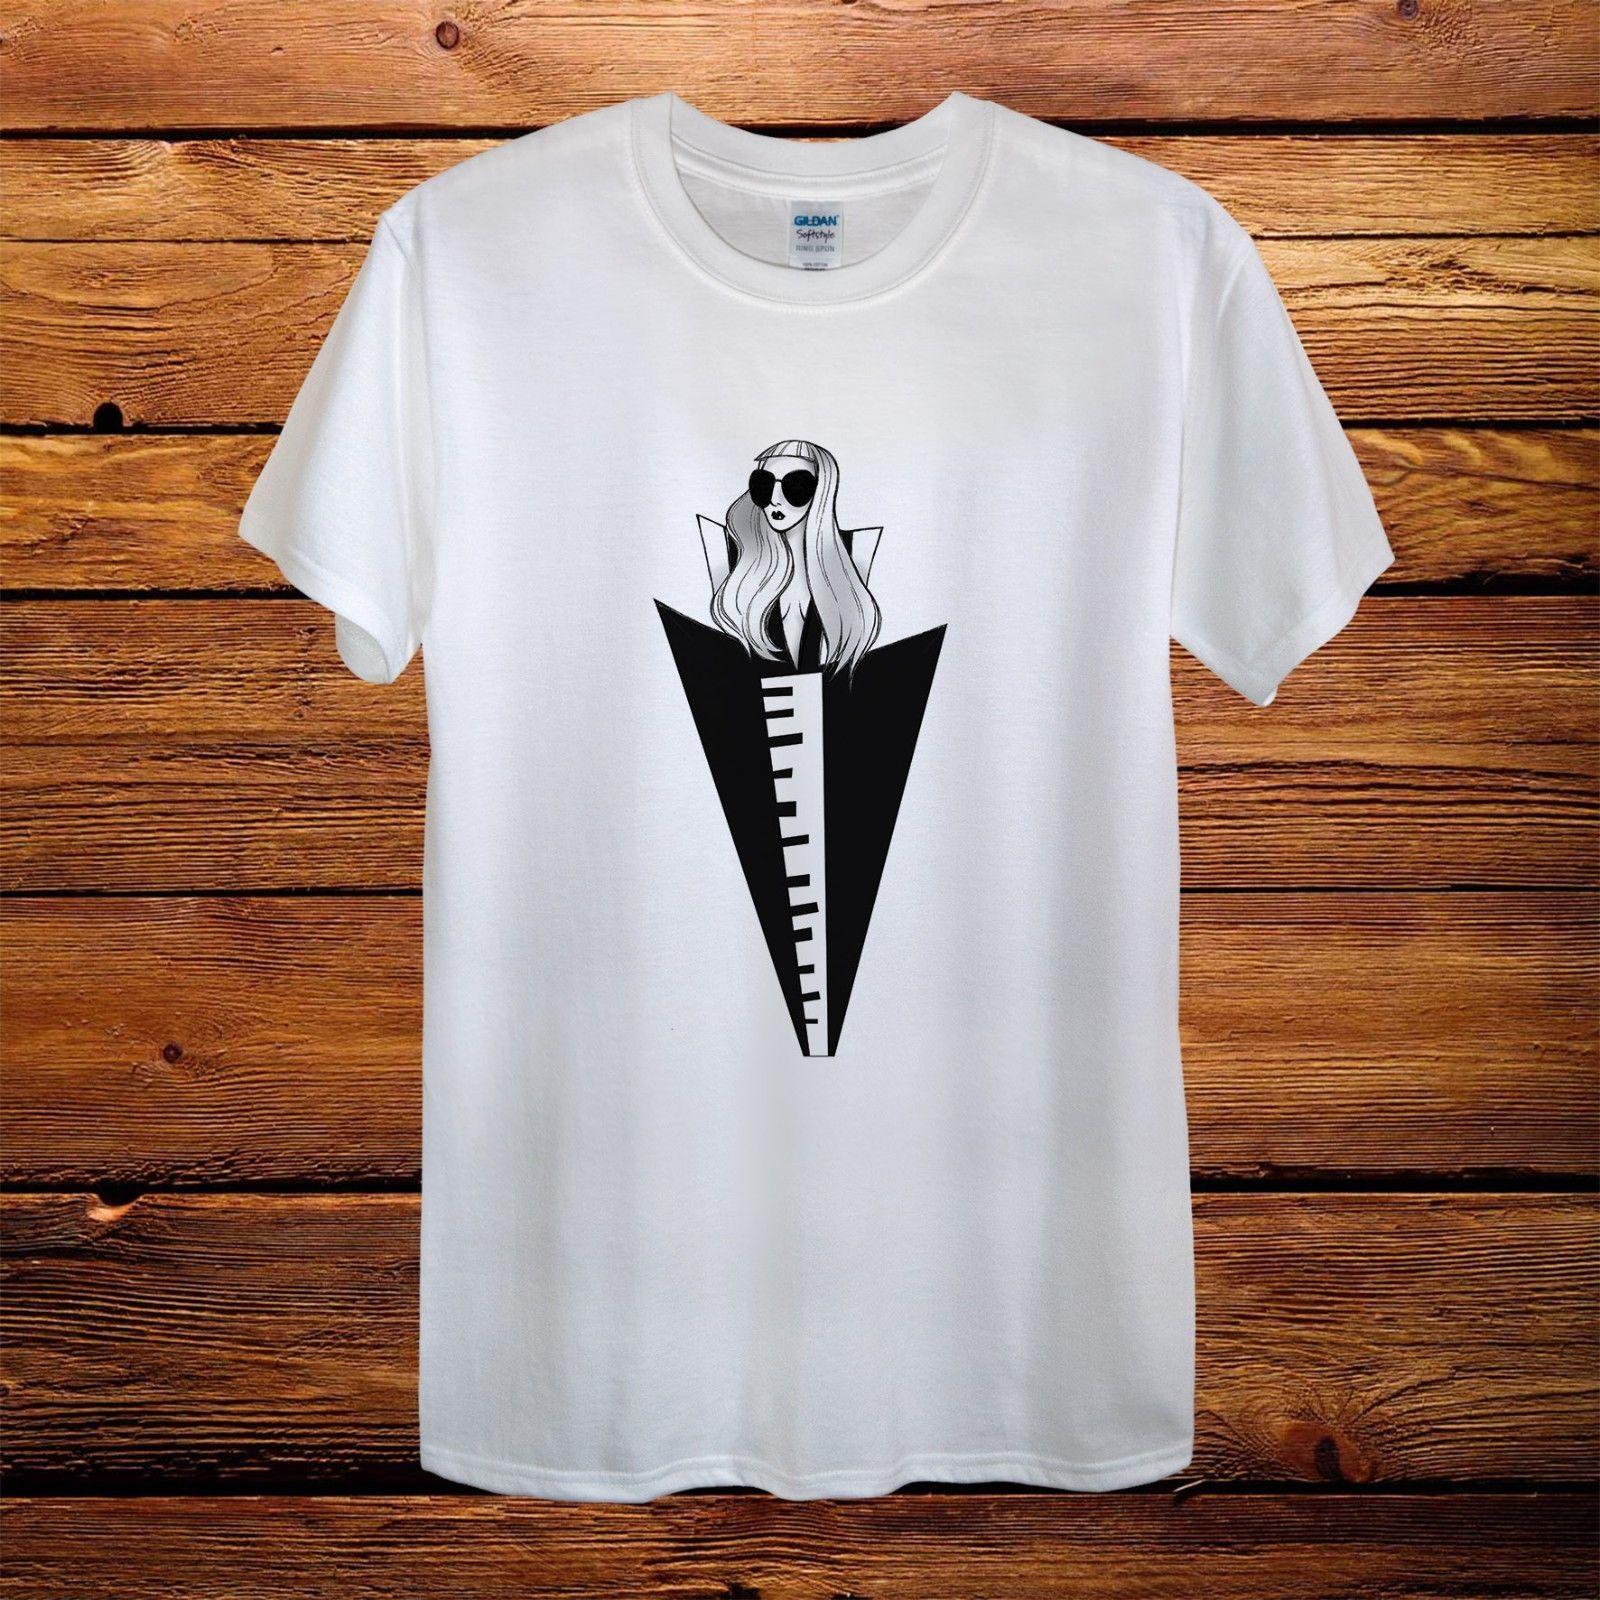 d5c592f8dcc4 Lady Gaga Top Design T-Shirt Men Unisex Women Fitted World Tour Gift ...